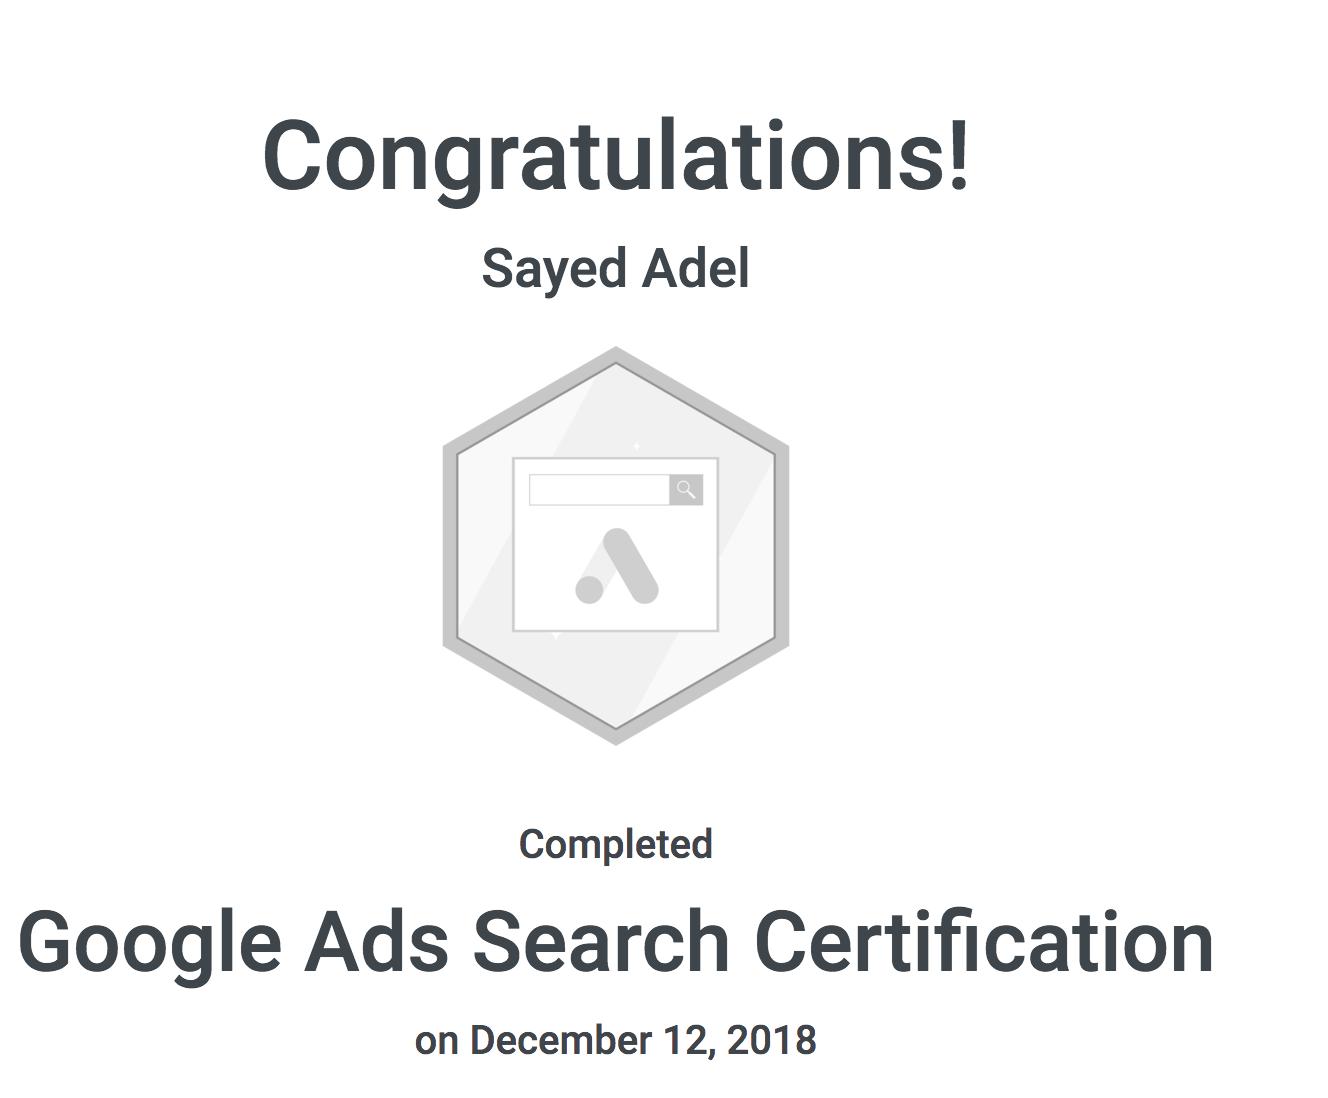 My Google Ads Certificate